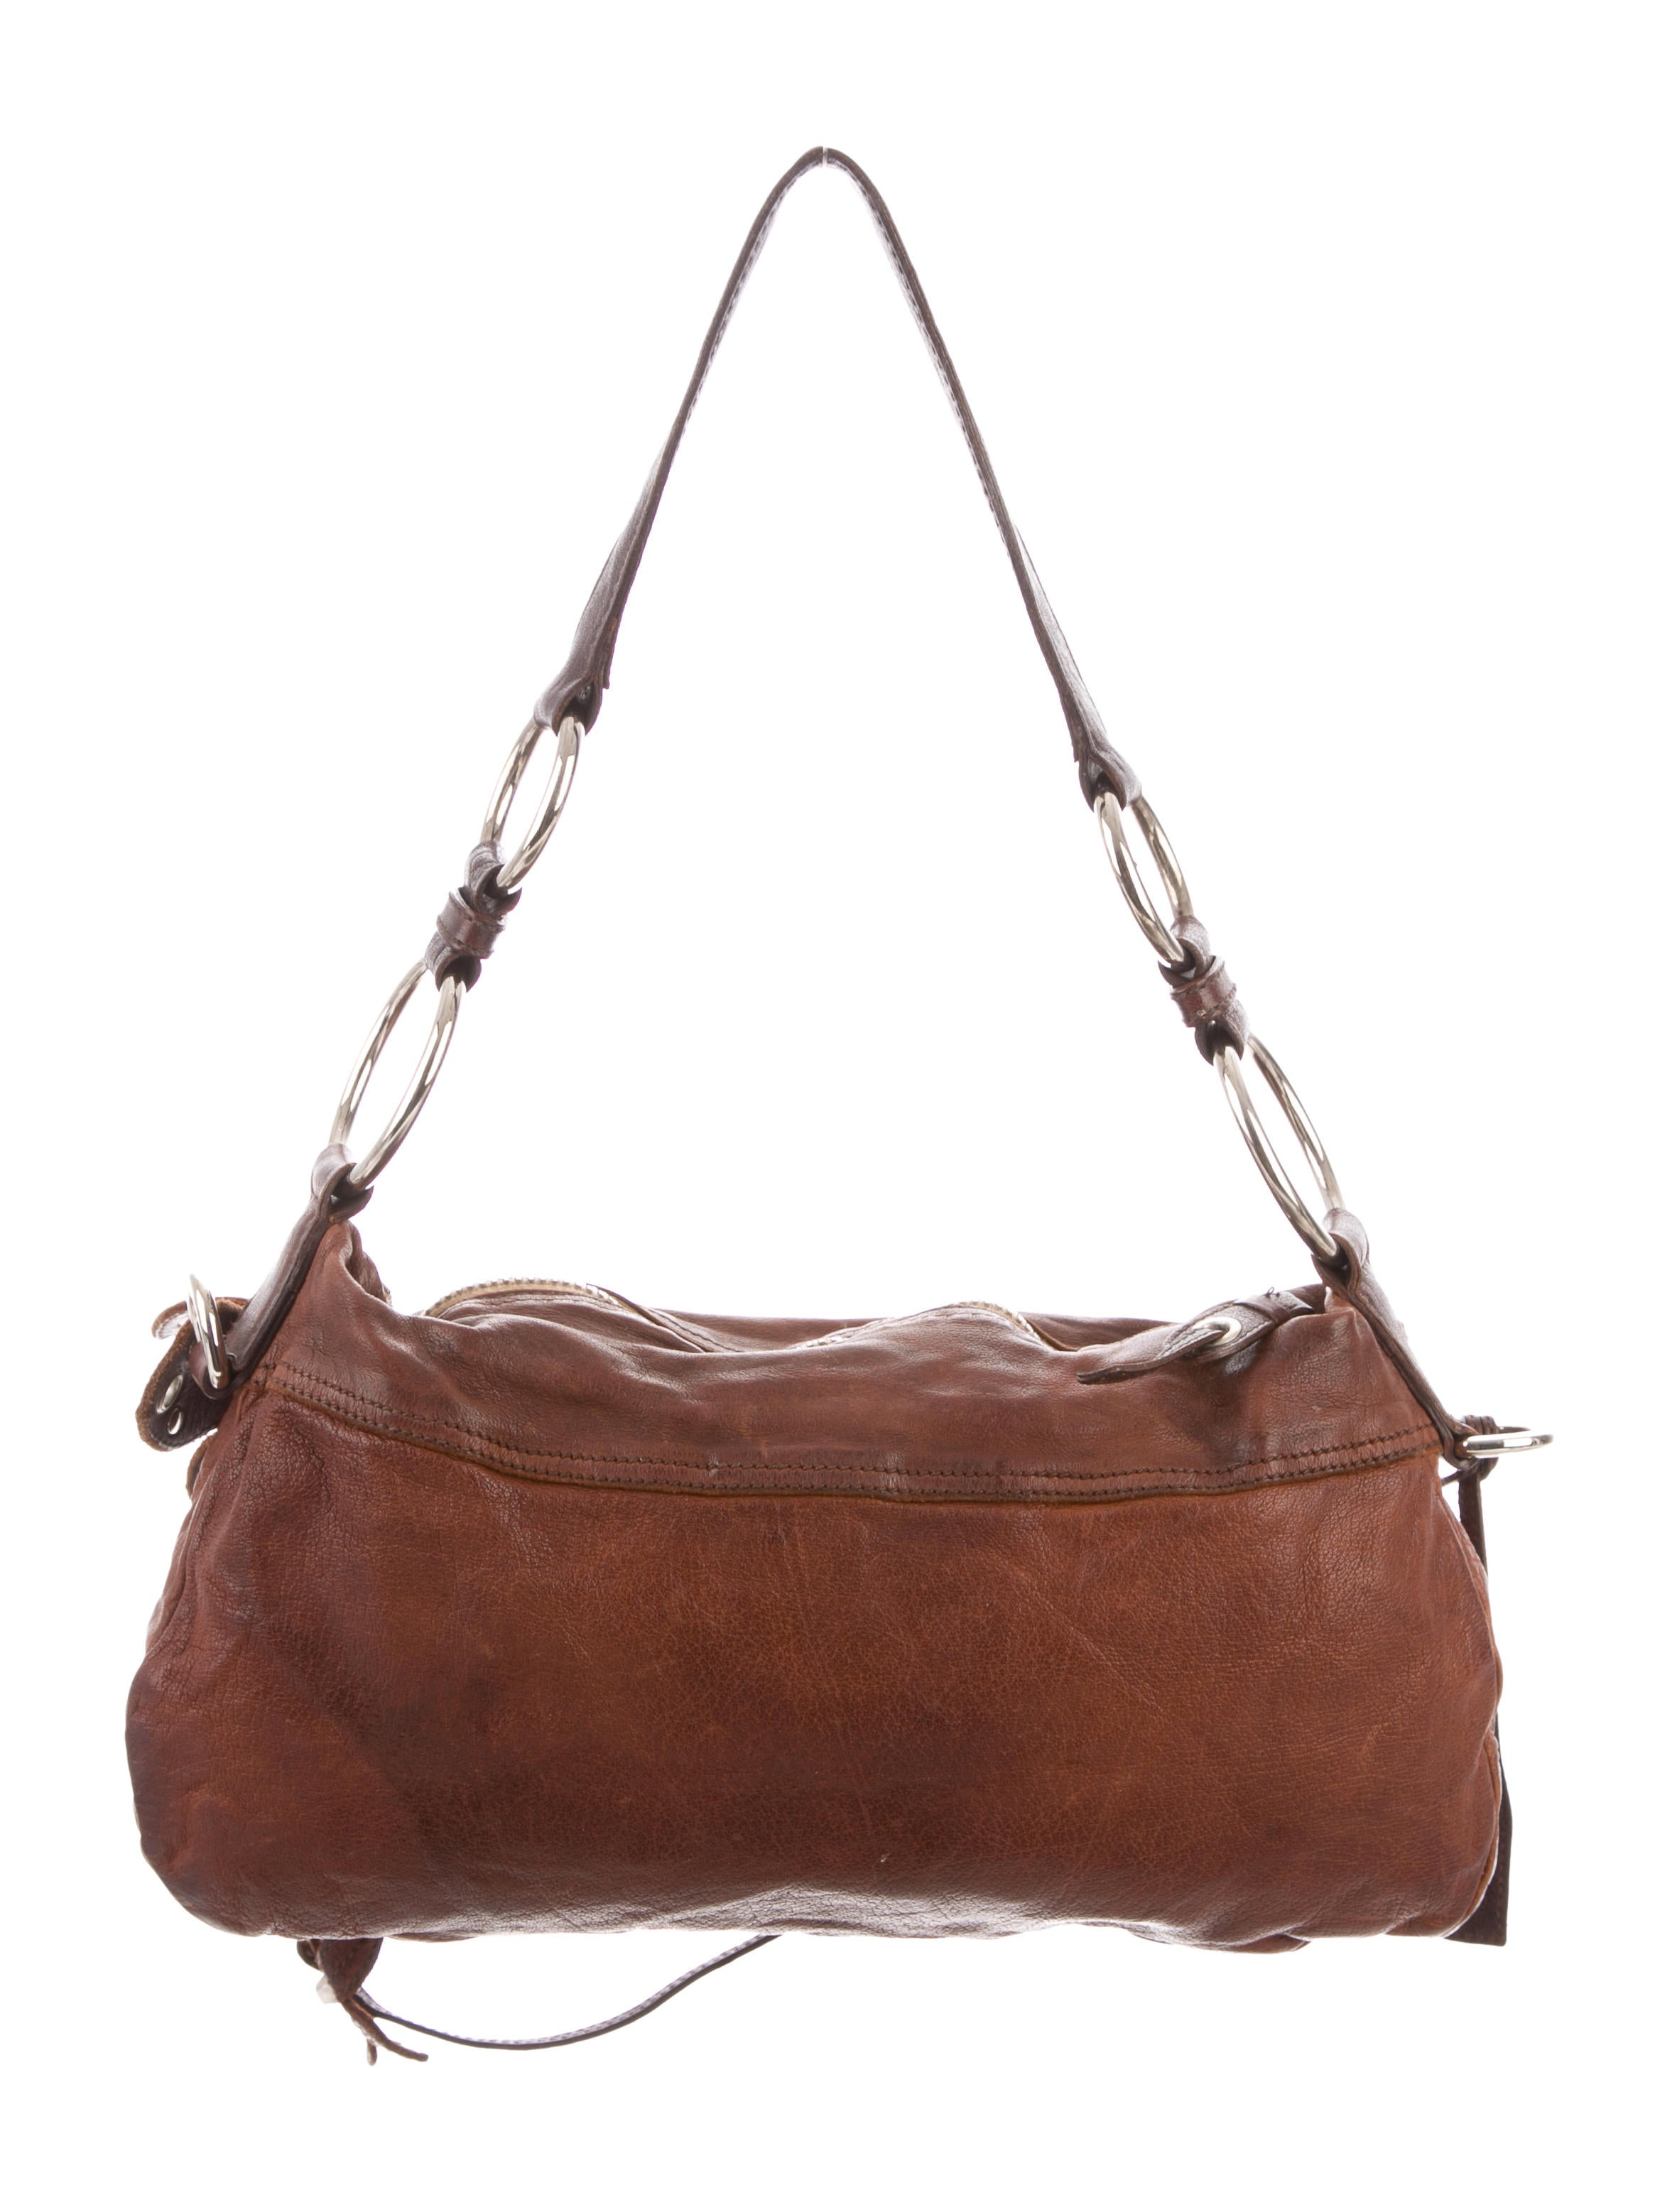 Miu Distressed Leather Bag Shoulder Miu P6r8qP-straits ... 2bdede73844b2